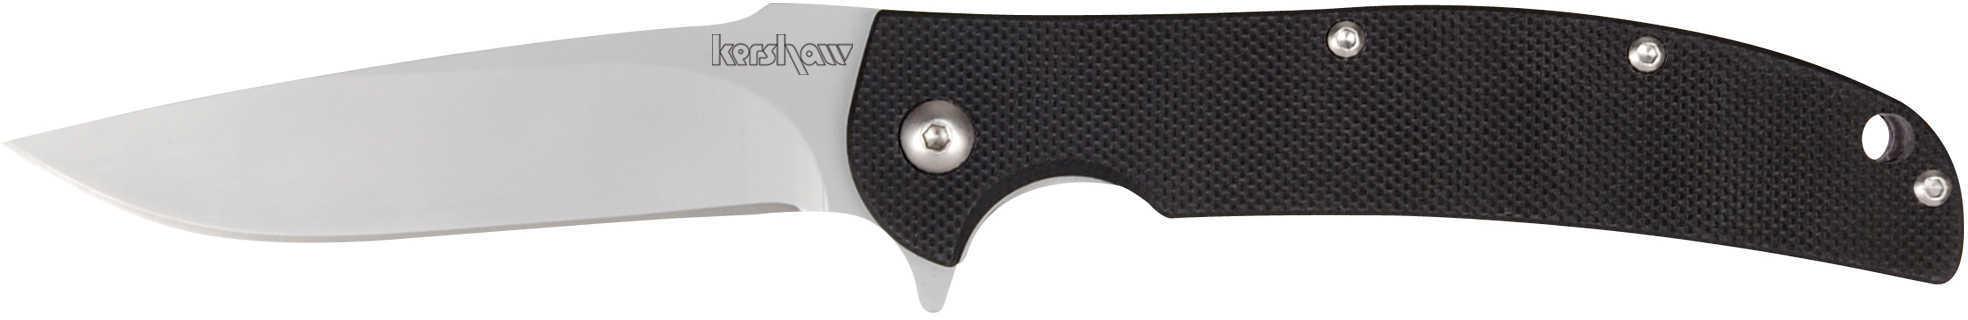 "Kershaw Chill 3.125"" Folding Knife Drop Point Plain Edge 8CR13MOV/Satin Black G10 Flipper/Pocket Clip 3410"